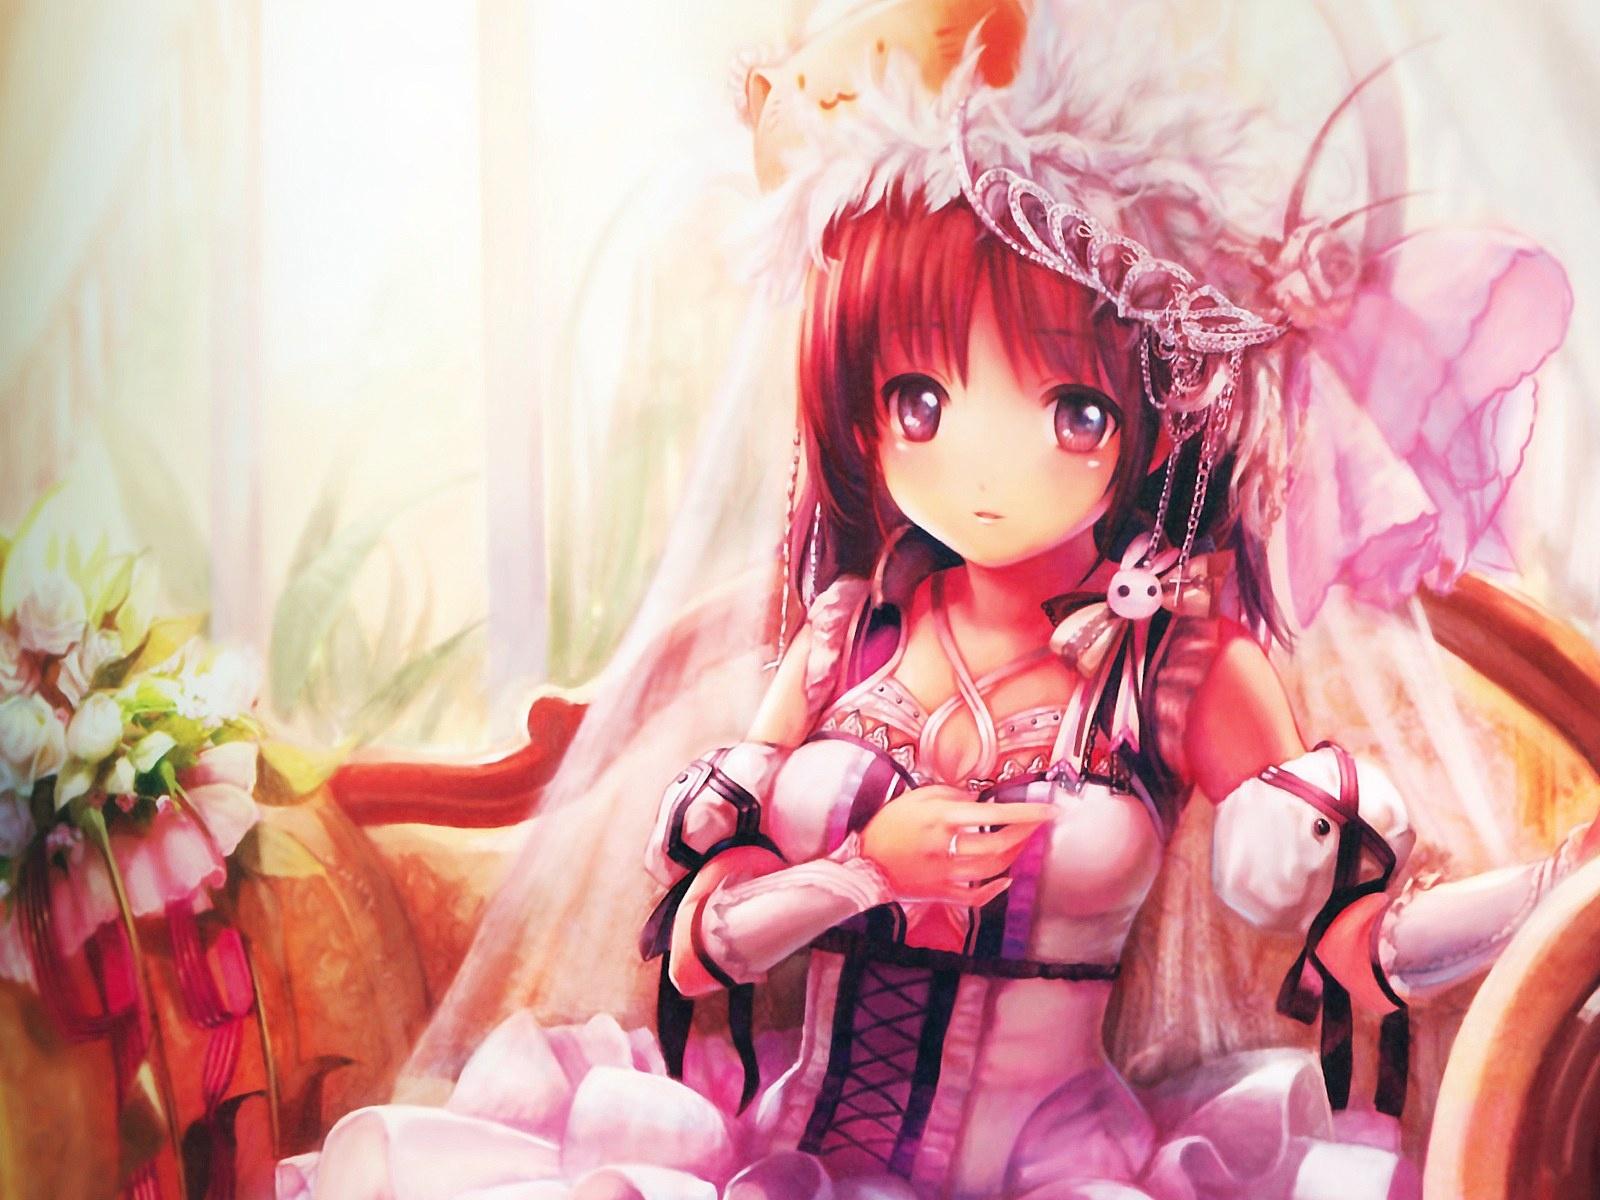 Cute anime girl dress up wallpaper 1600x1200 resolution - Anime 1600x1200 ...